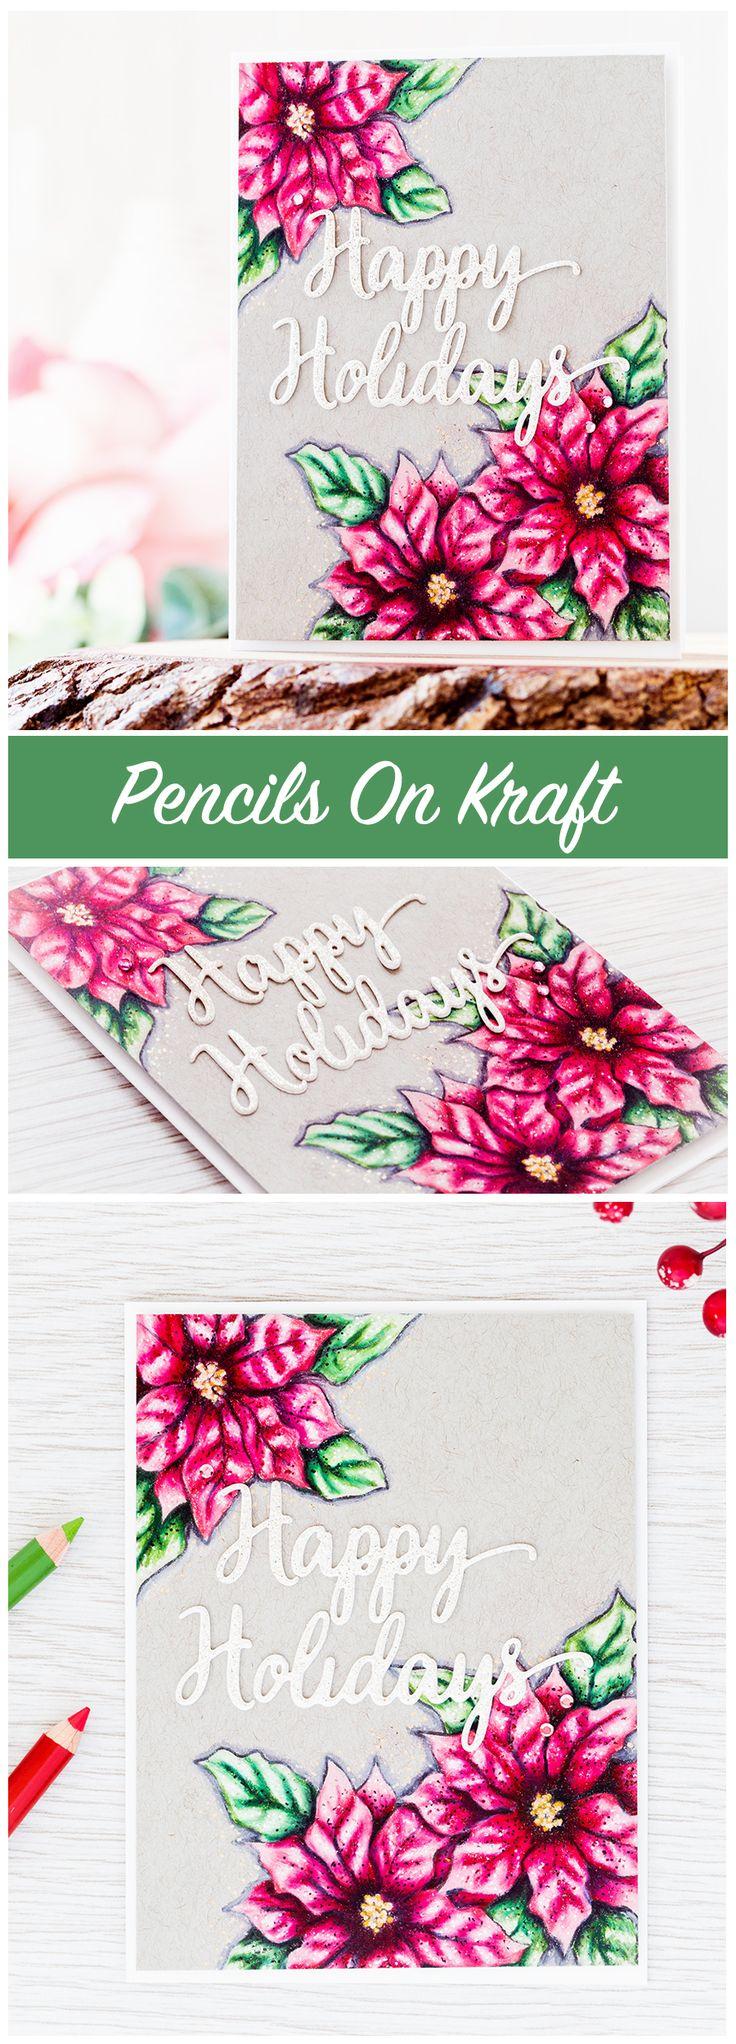 Scrapbook ideas christmas card - Poinsettias With Colored Pencils Sales News Ideas Scrapbookingxmas Cardscreative